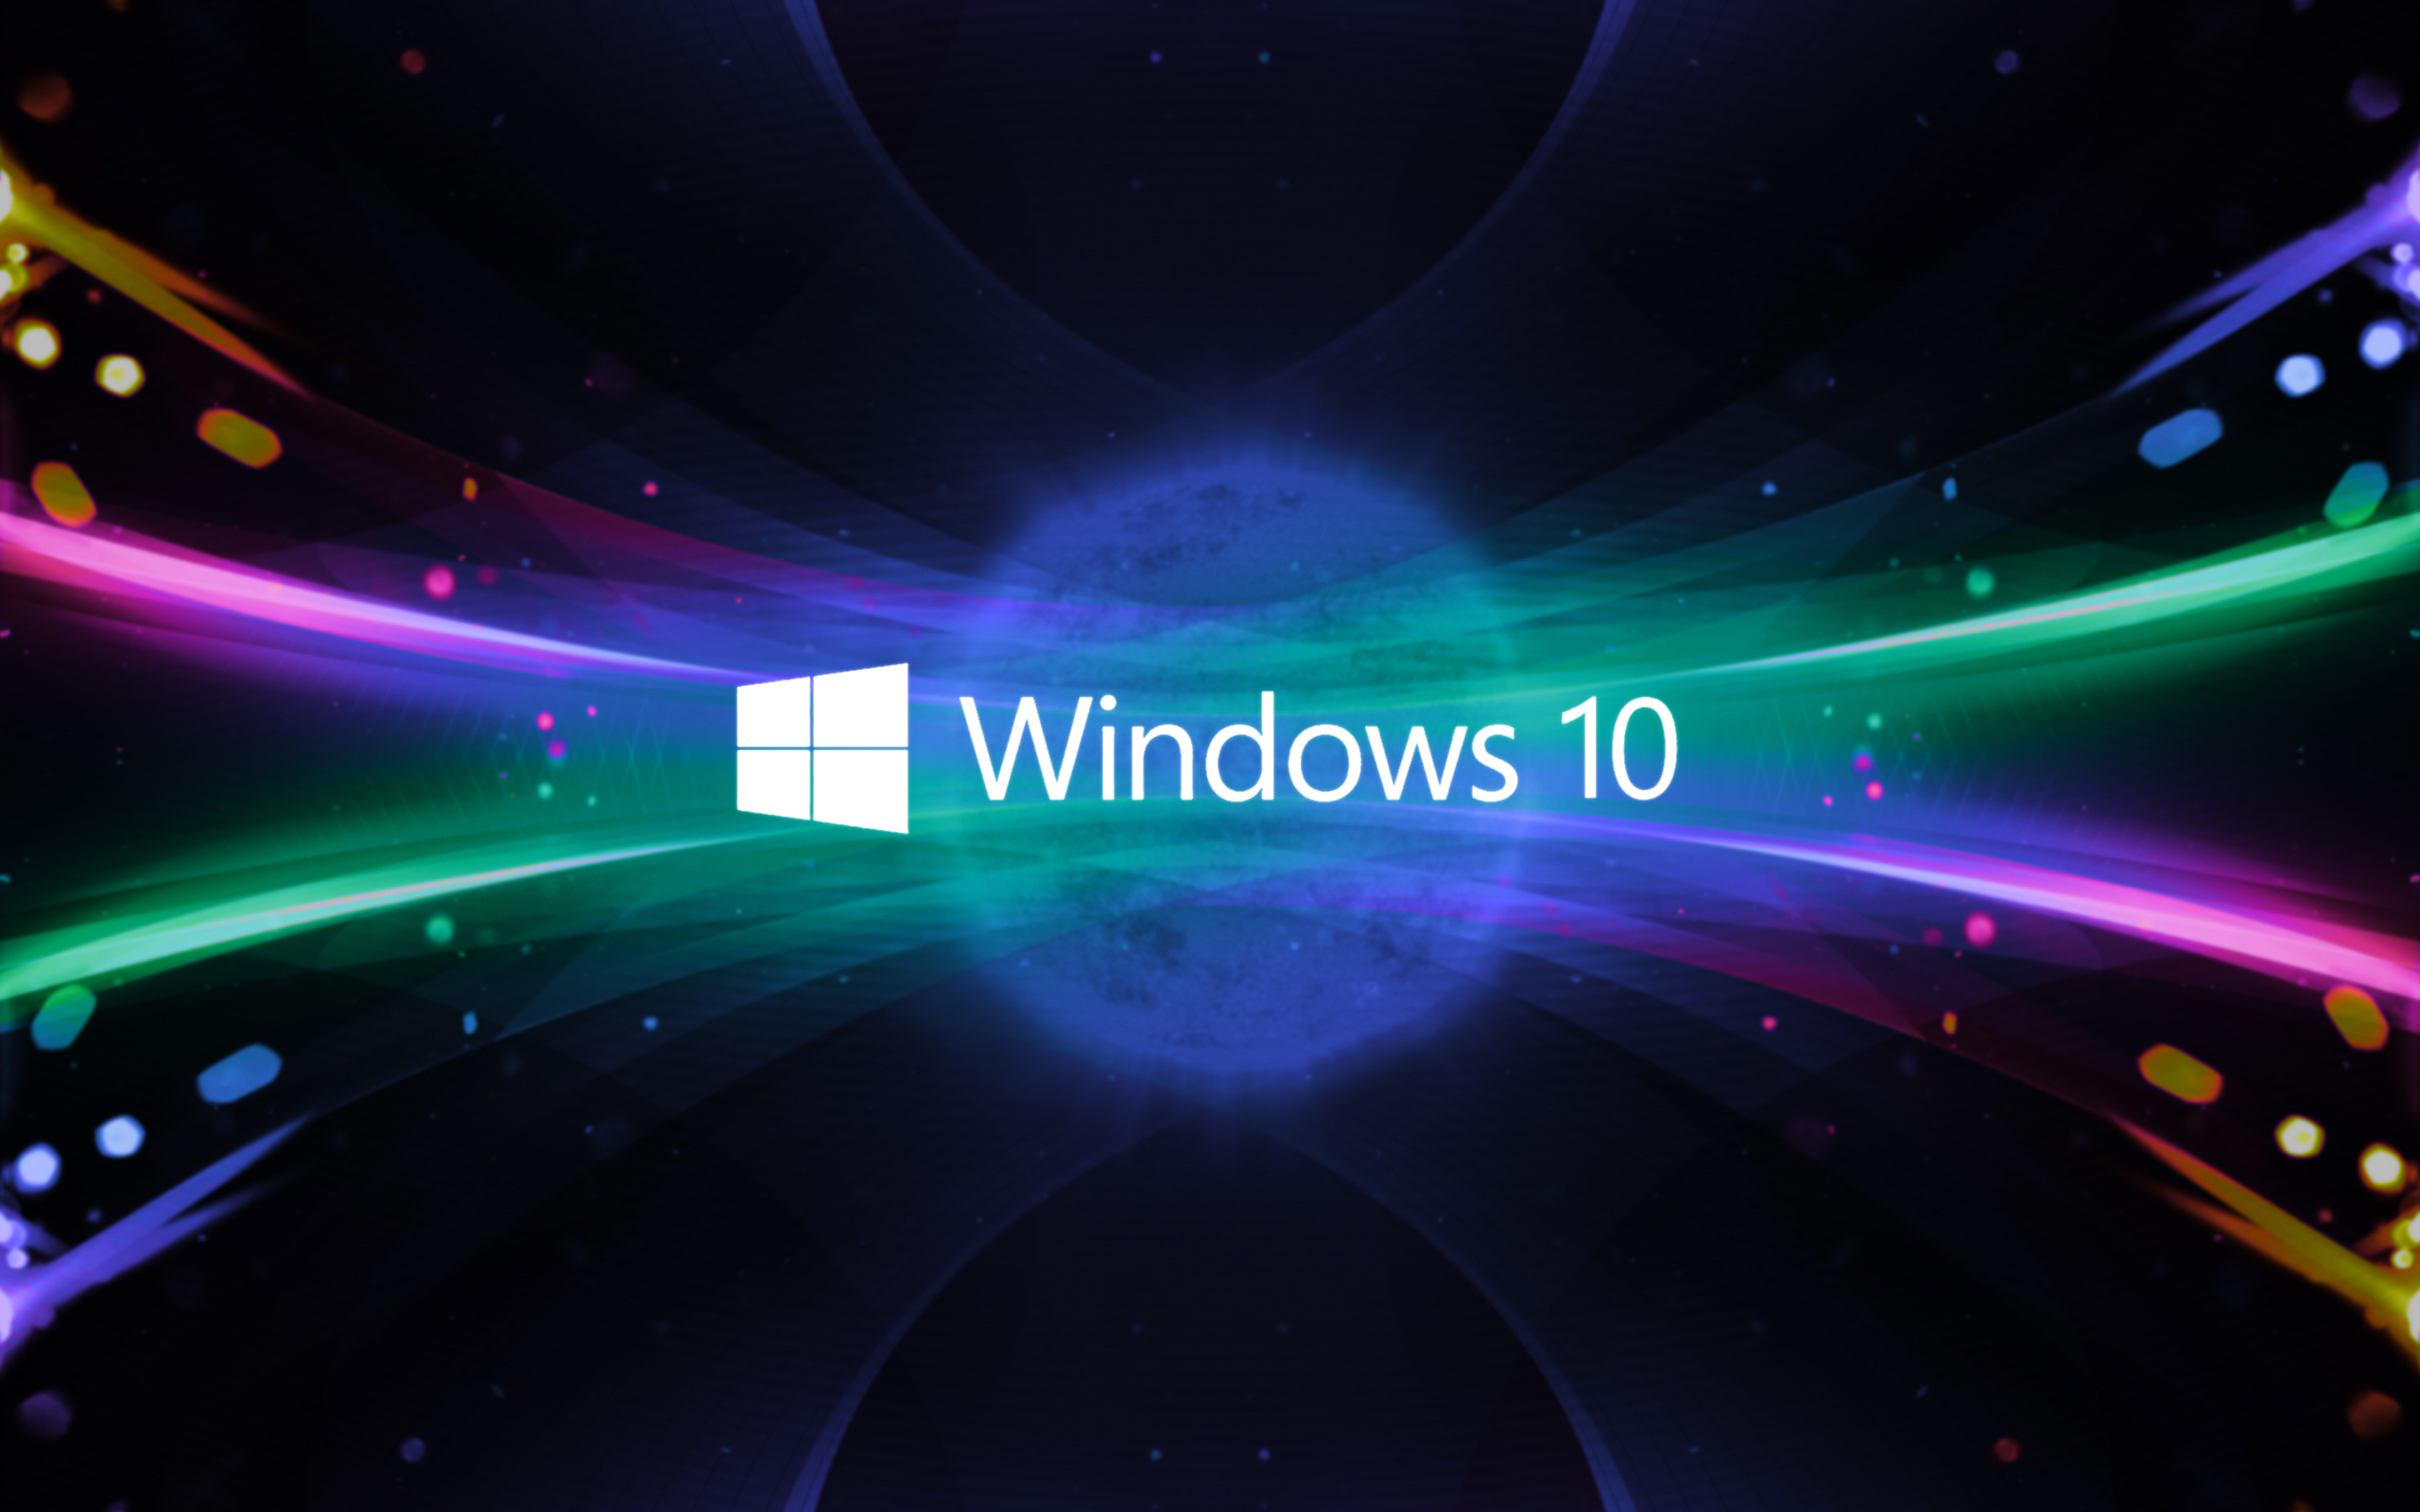 windows 10 desktop is black 13 high resolution wallpaper